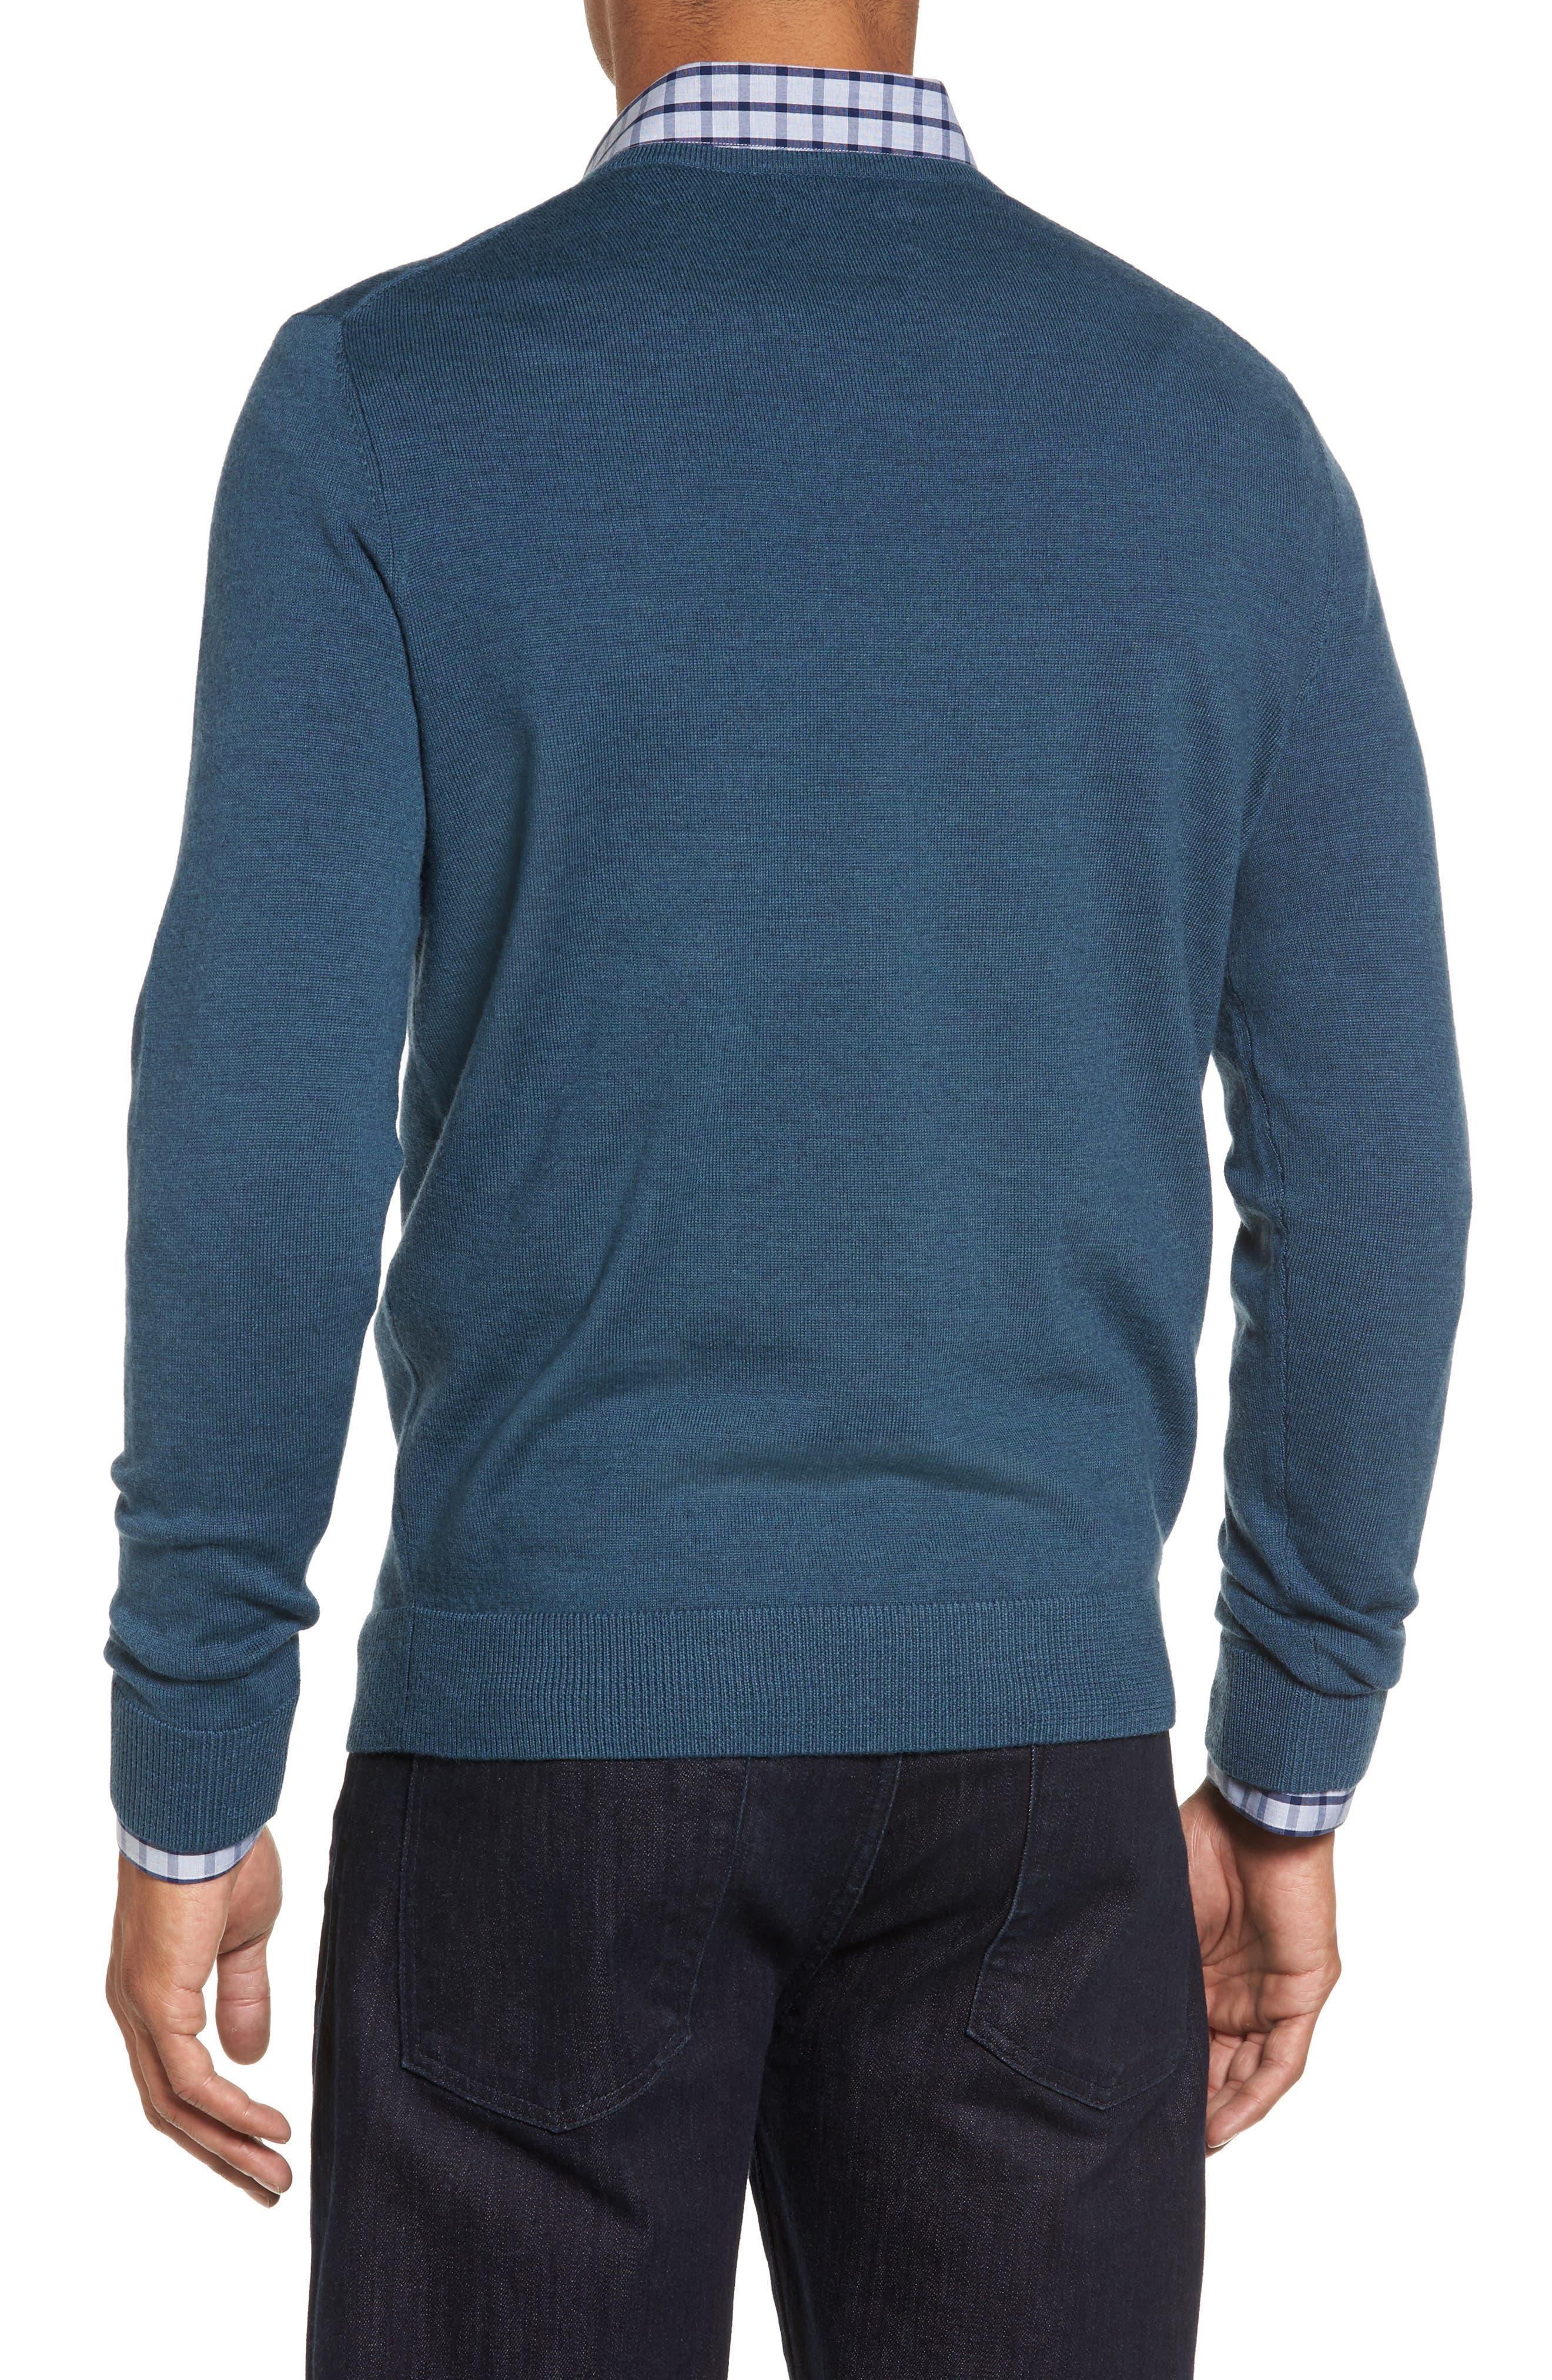 Alternate Image 2  - Nordstrom Men's Shop V-Neck Merino Wool Sweater (Regular & Tall)